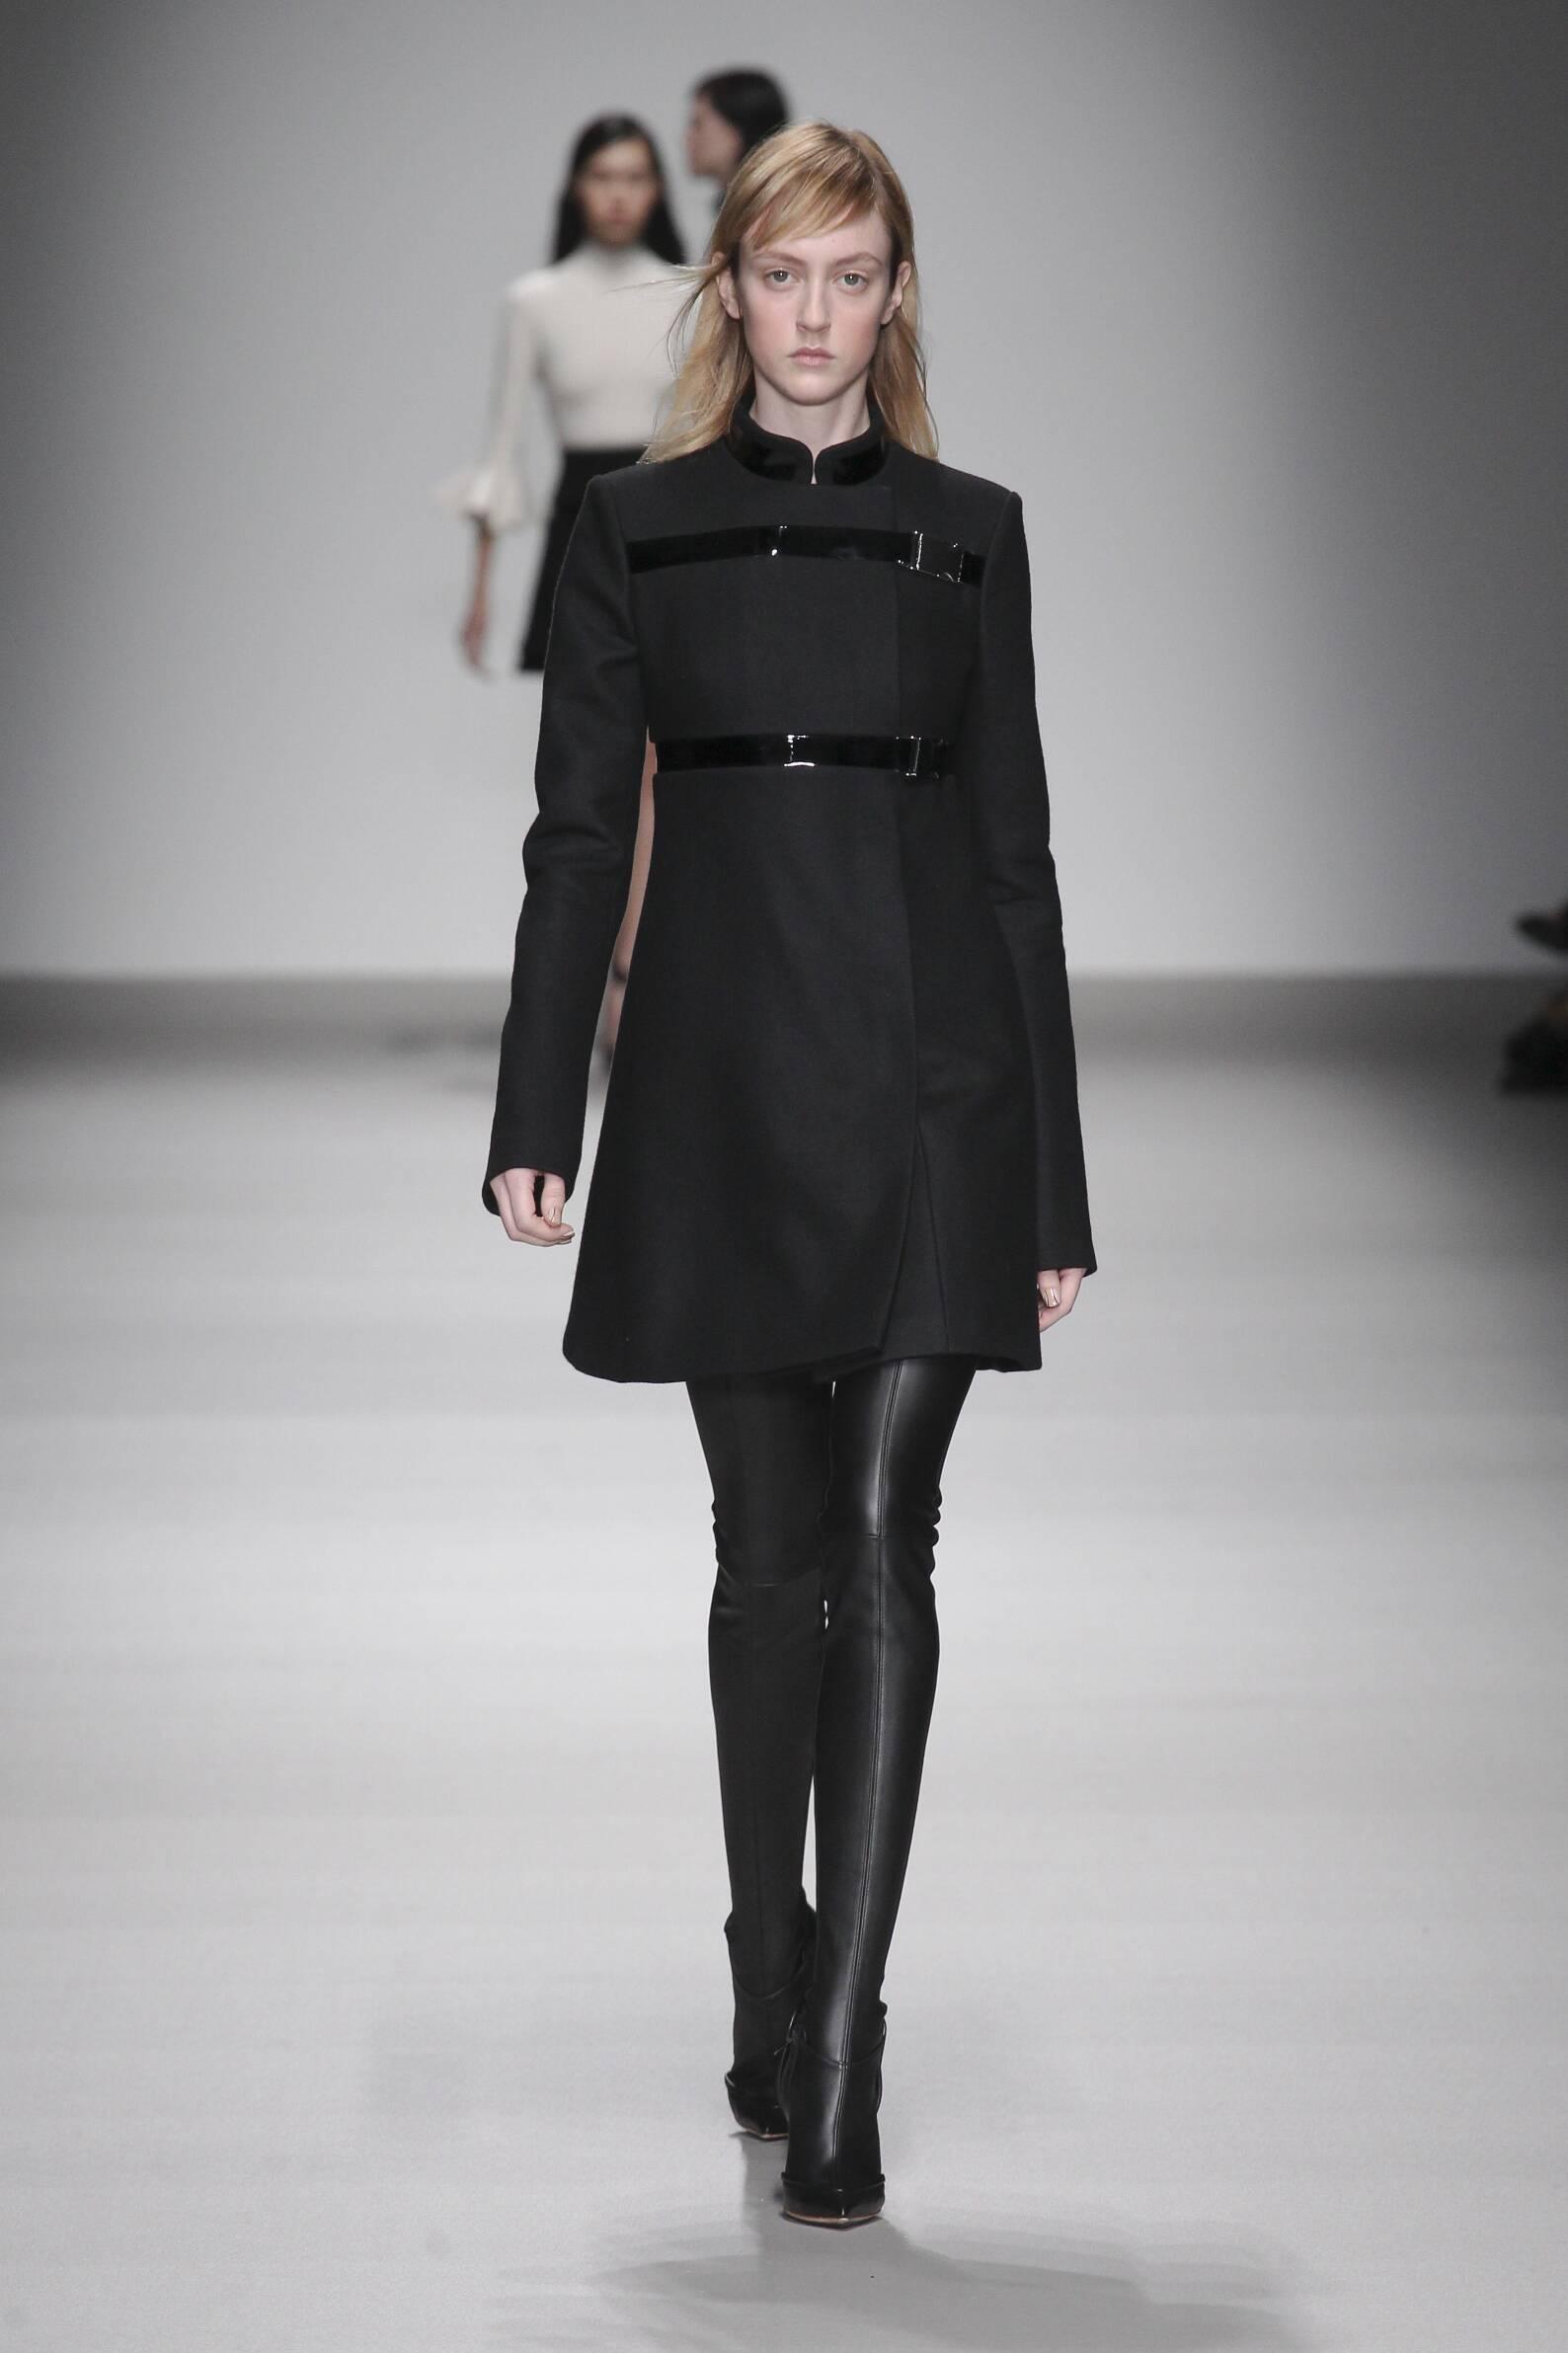 Fall 2015 Fashion Trends David Koma Collection